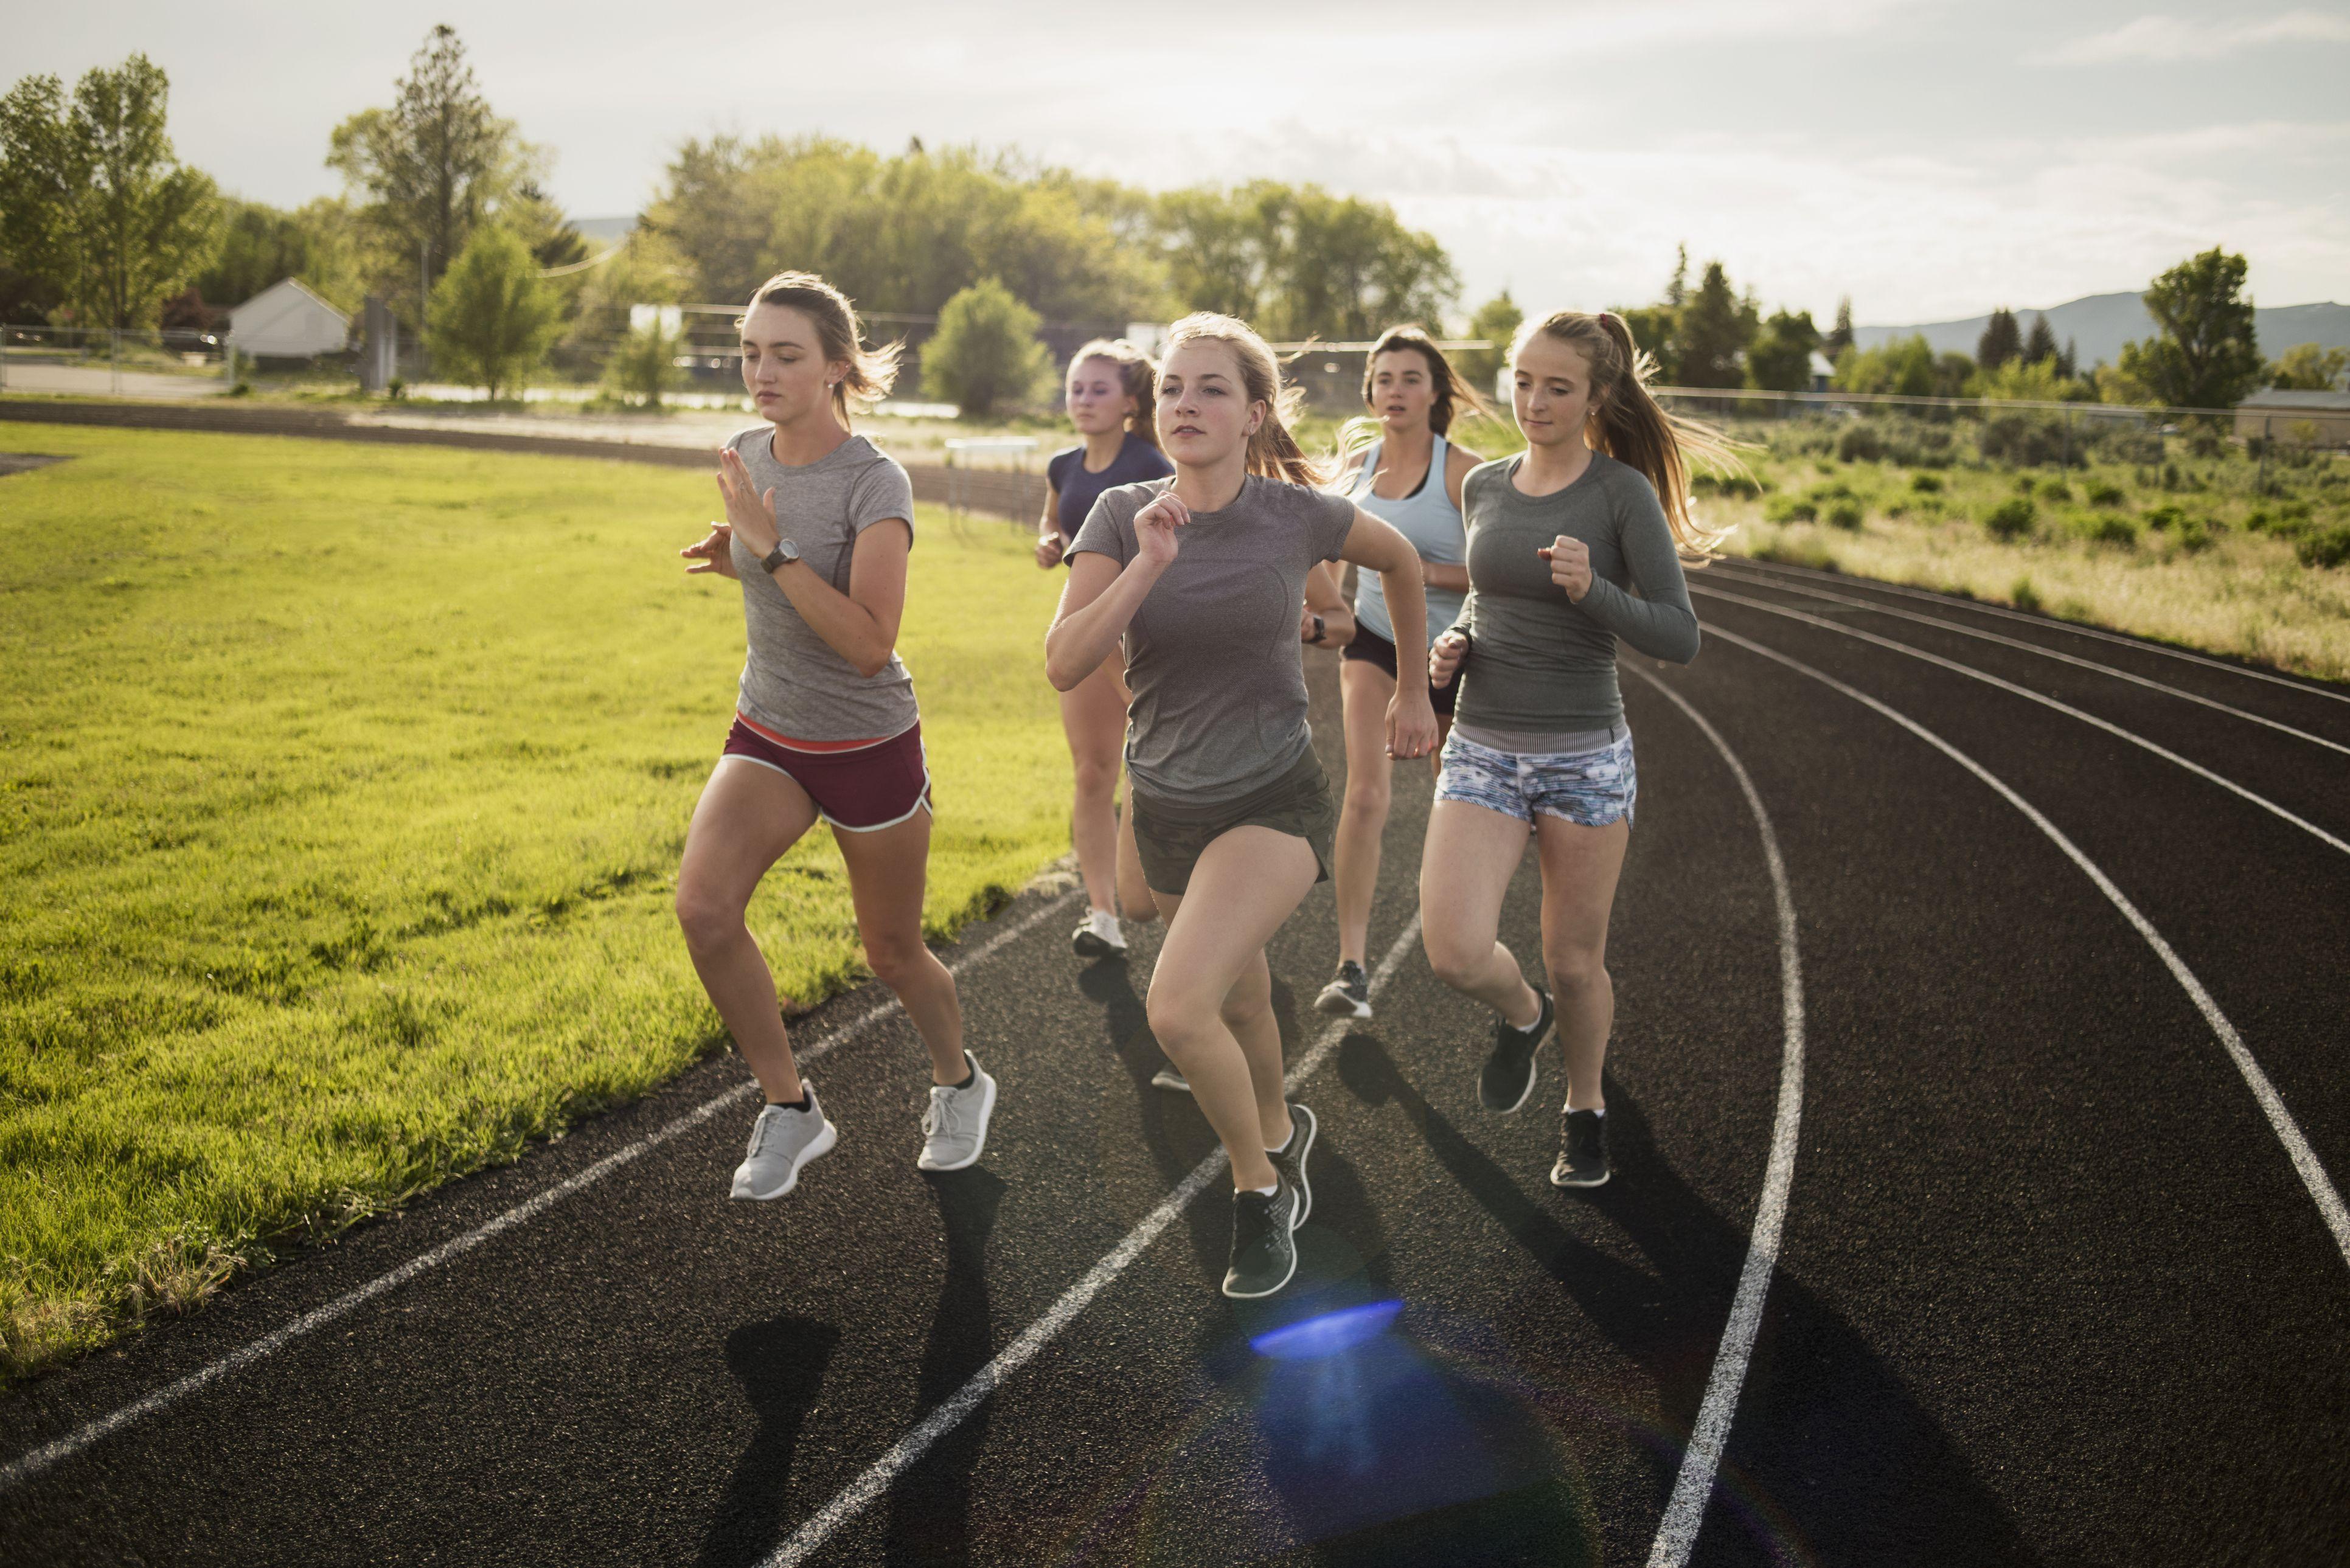 Kids Running - Tips for Girls Running During Puberty